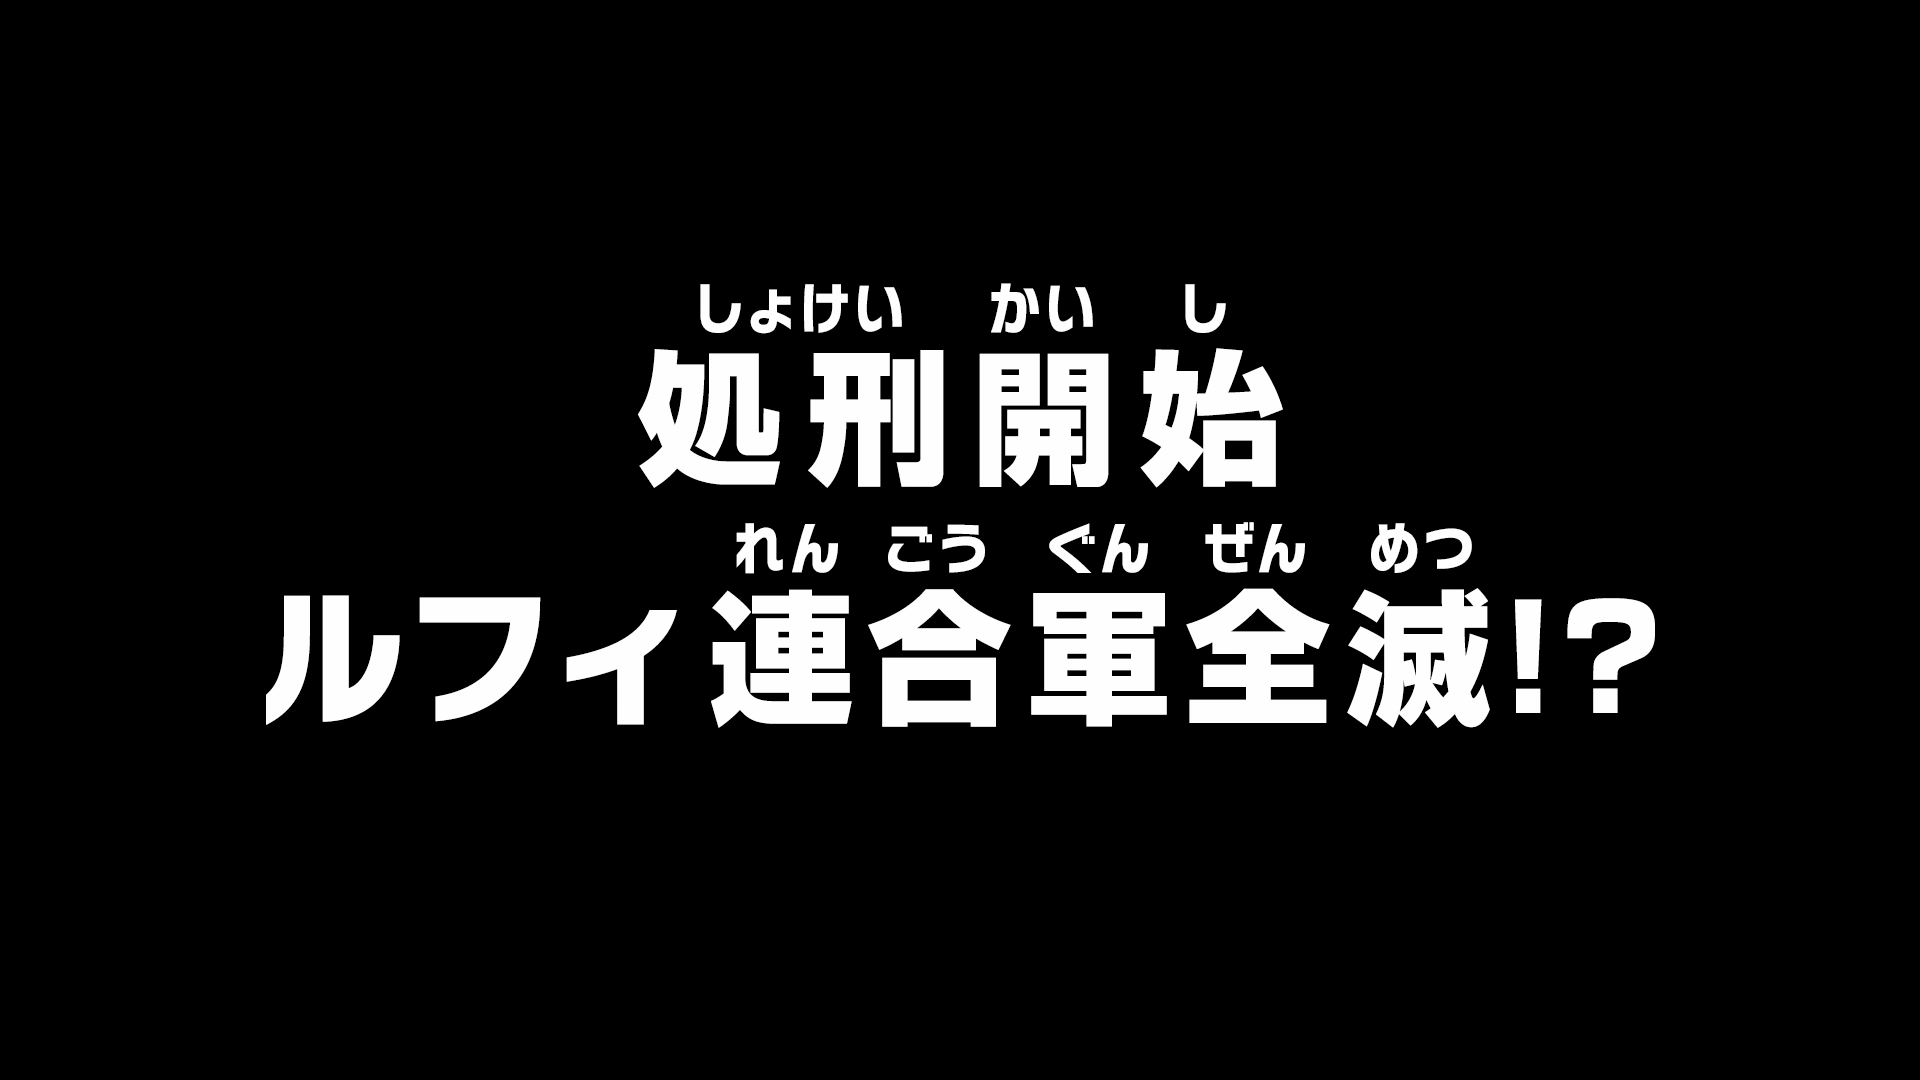 Episode 842